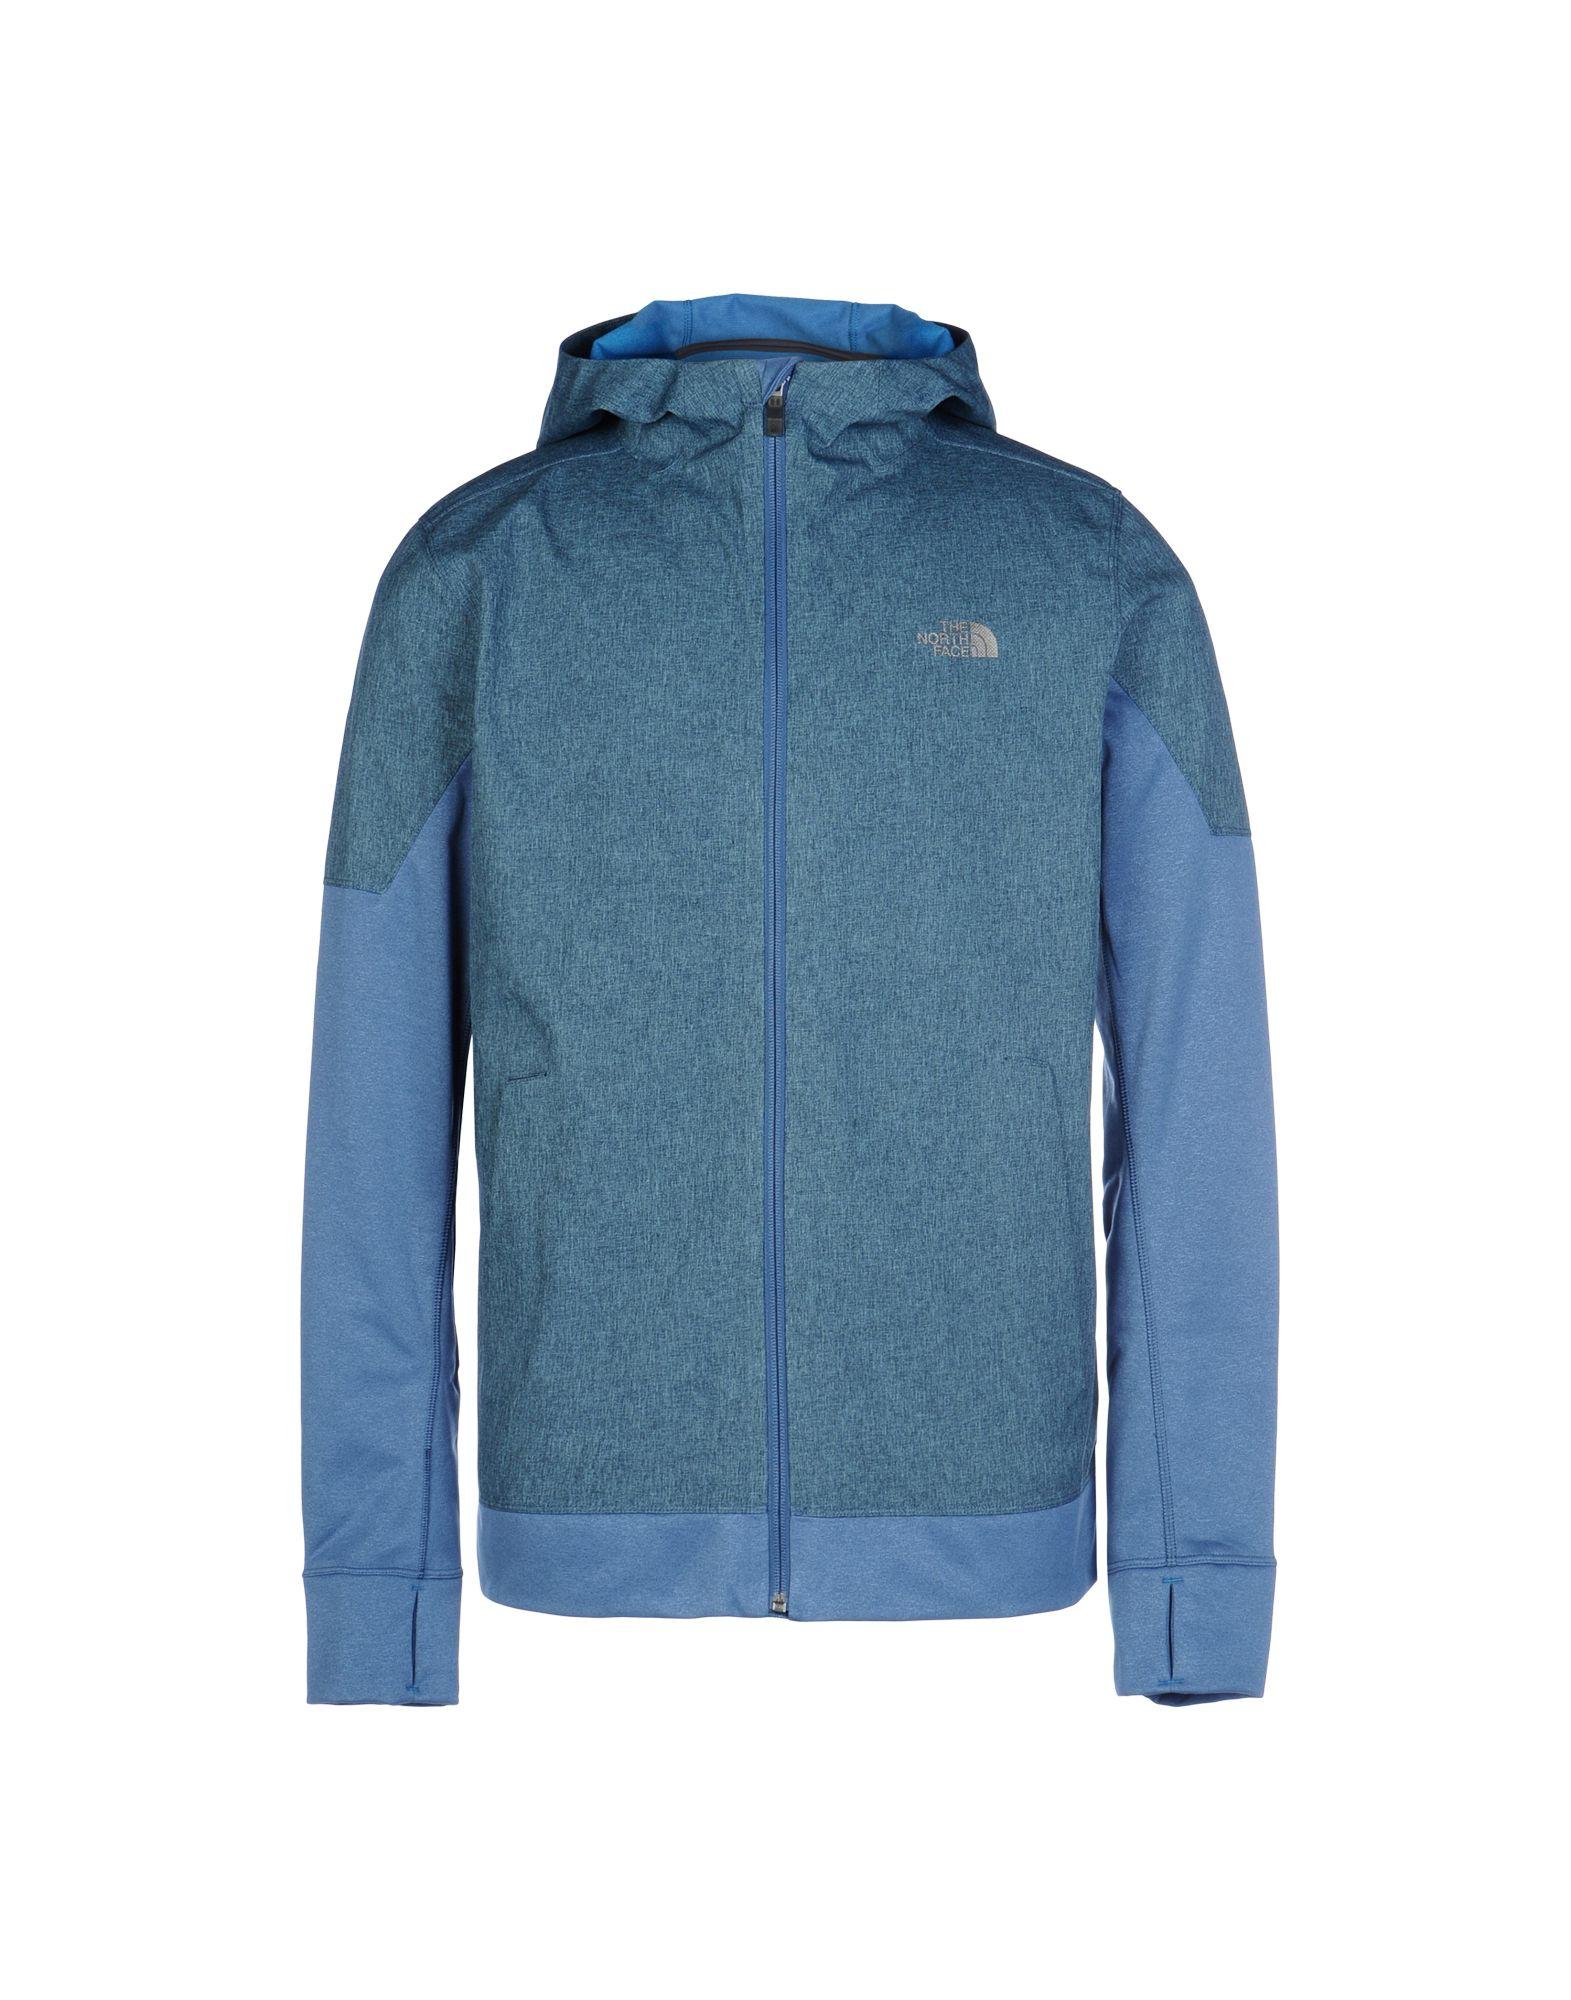 Giubbotto The North Face M Kilowatt Fleece Jacket Training - Uomo - Acquista online su